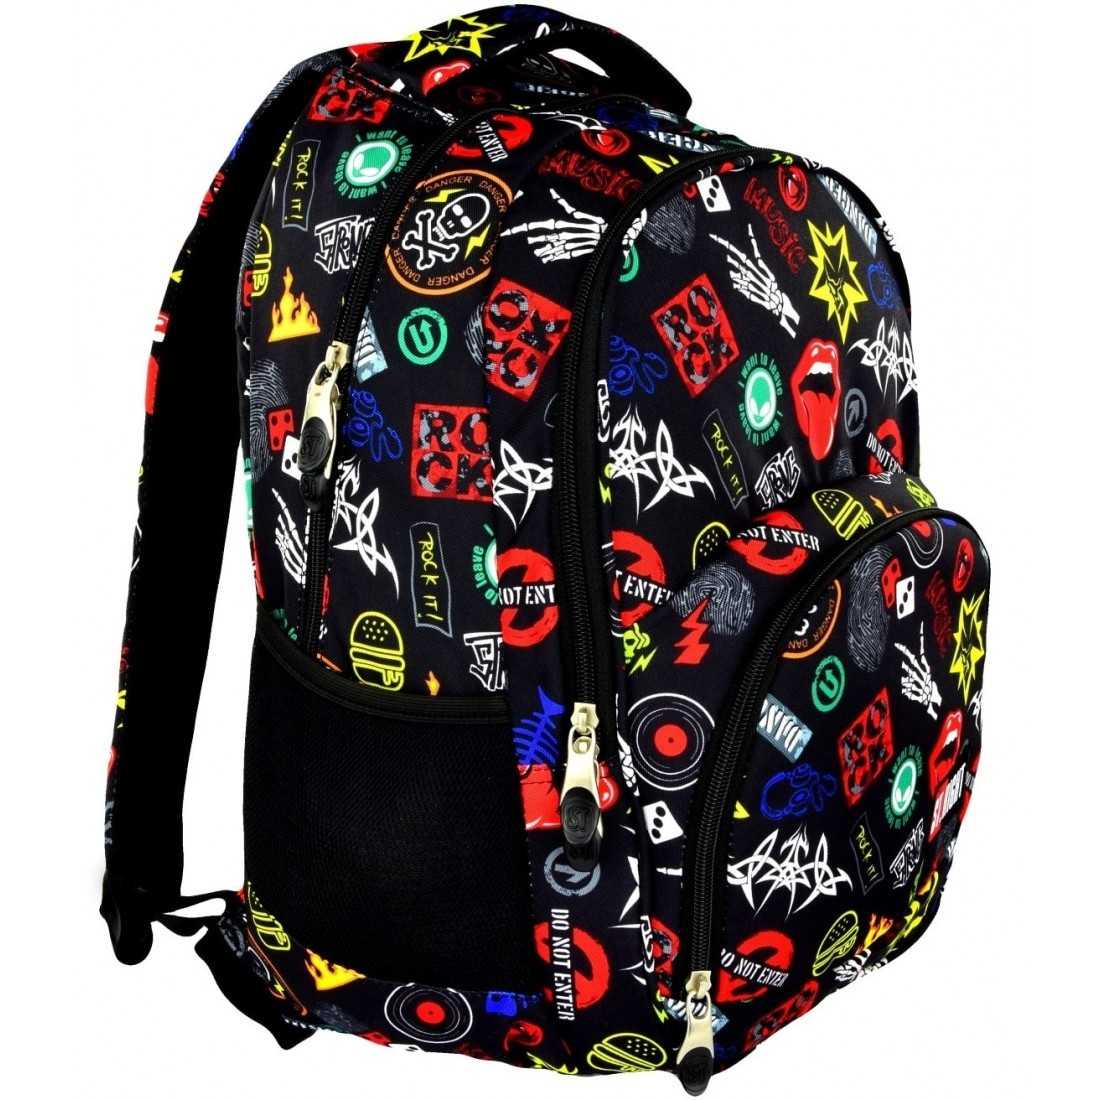 5dc428925b30d Superlekki plecak szkolny ST.RIGHT BADGES dla chłopca, dla ...